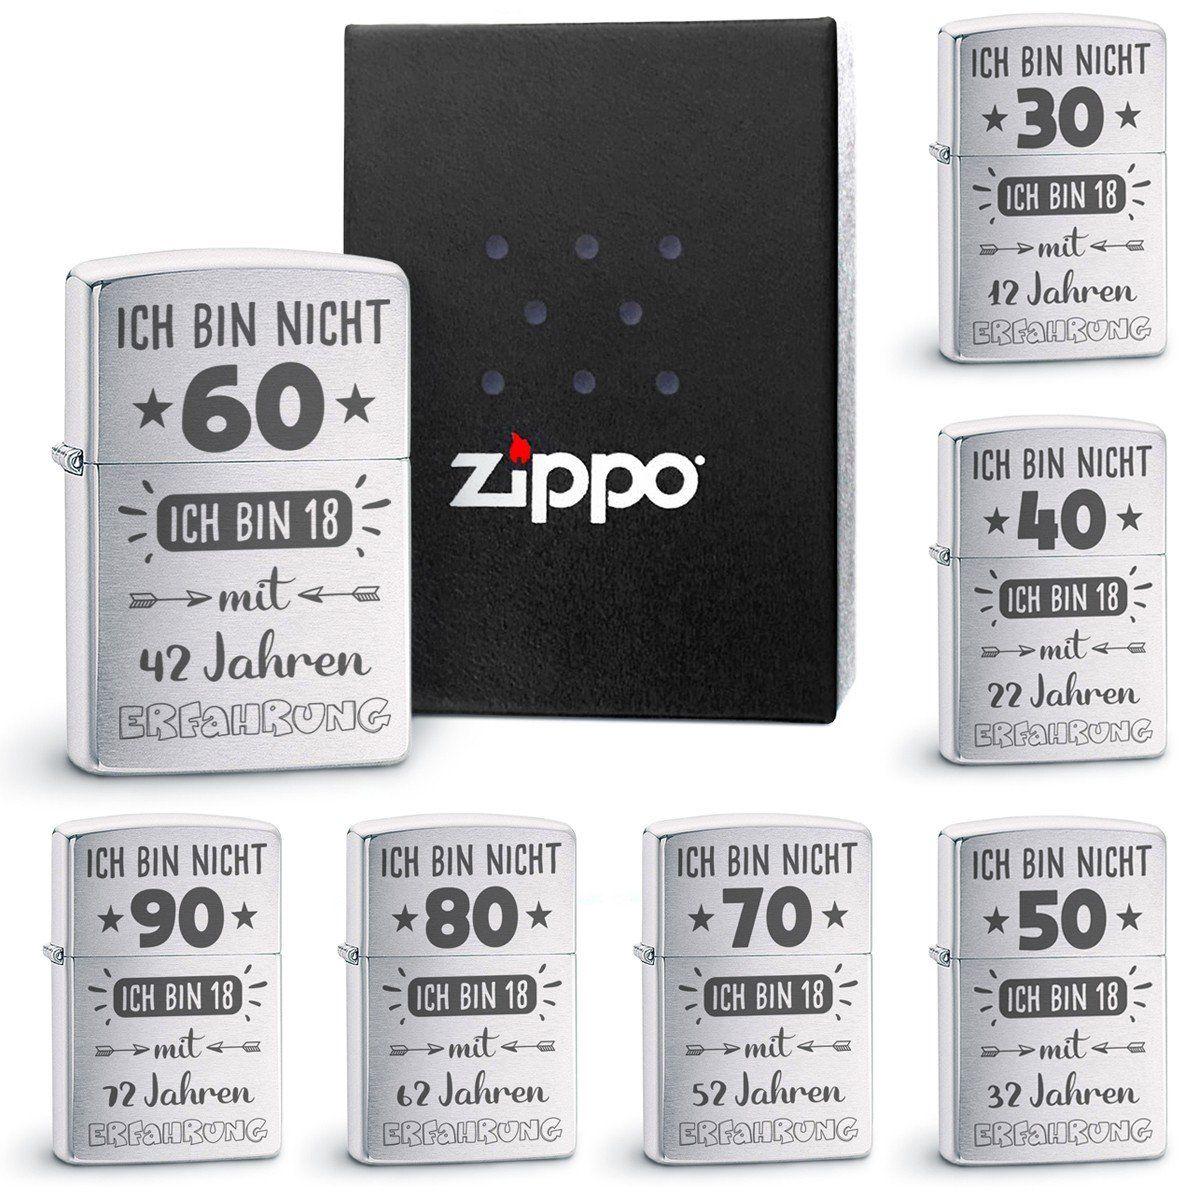 Feuerzeug Zippo Original Ich Bin Nicht 30 Feuerzeug Coole Geschenke Zippo Benzin